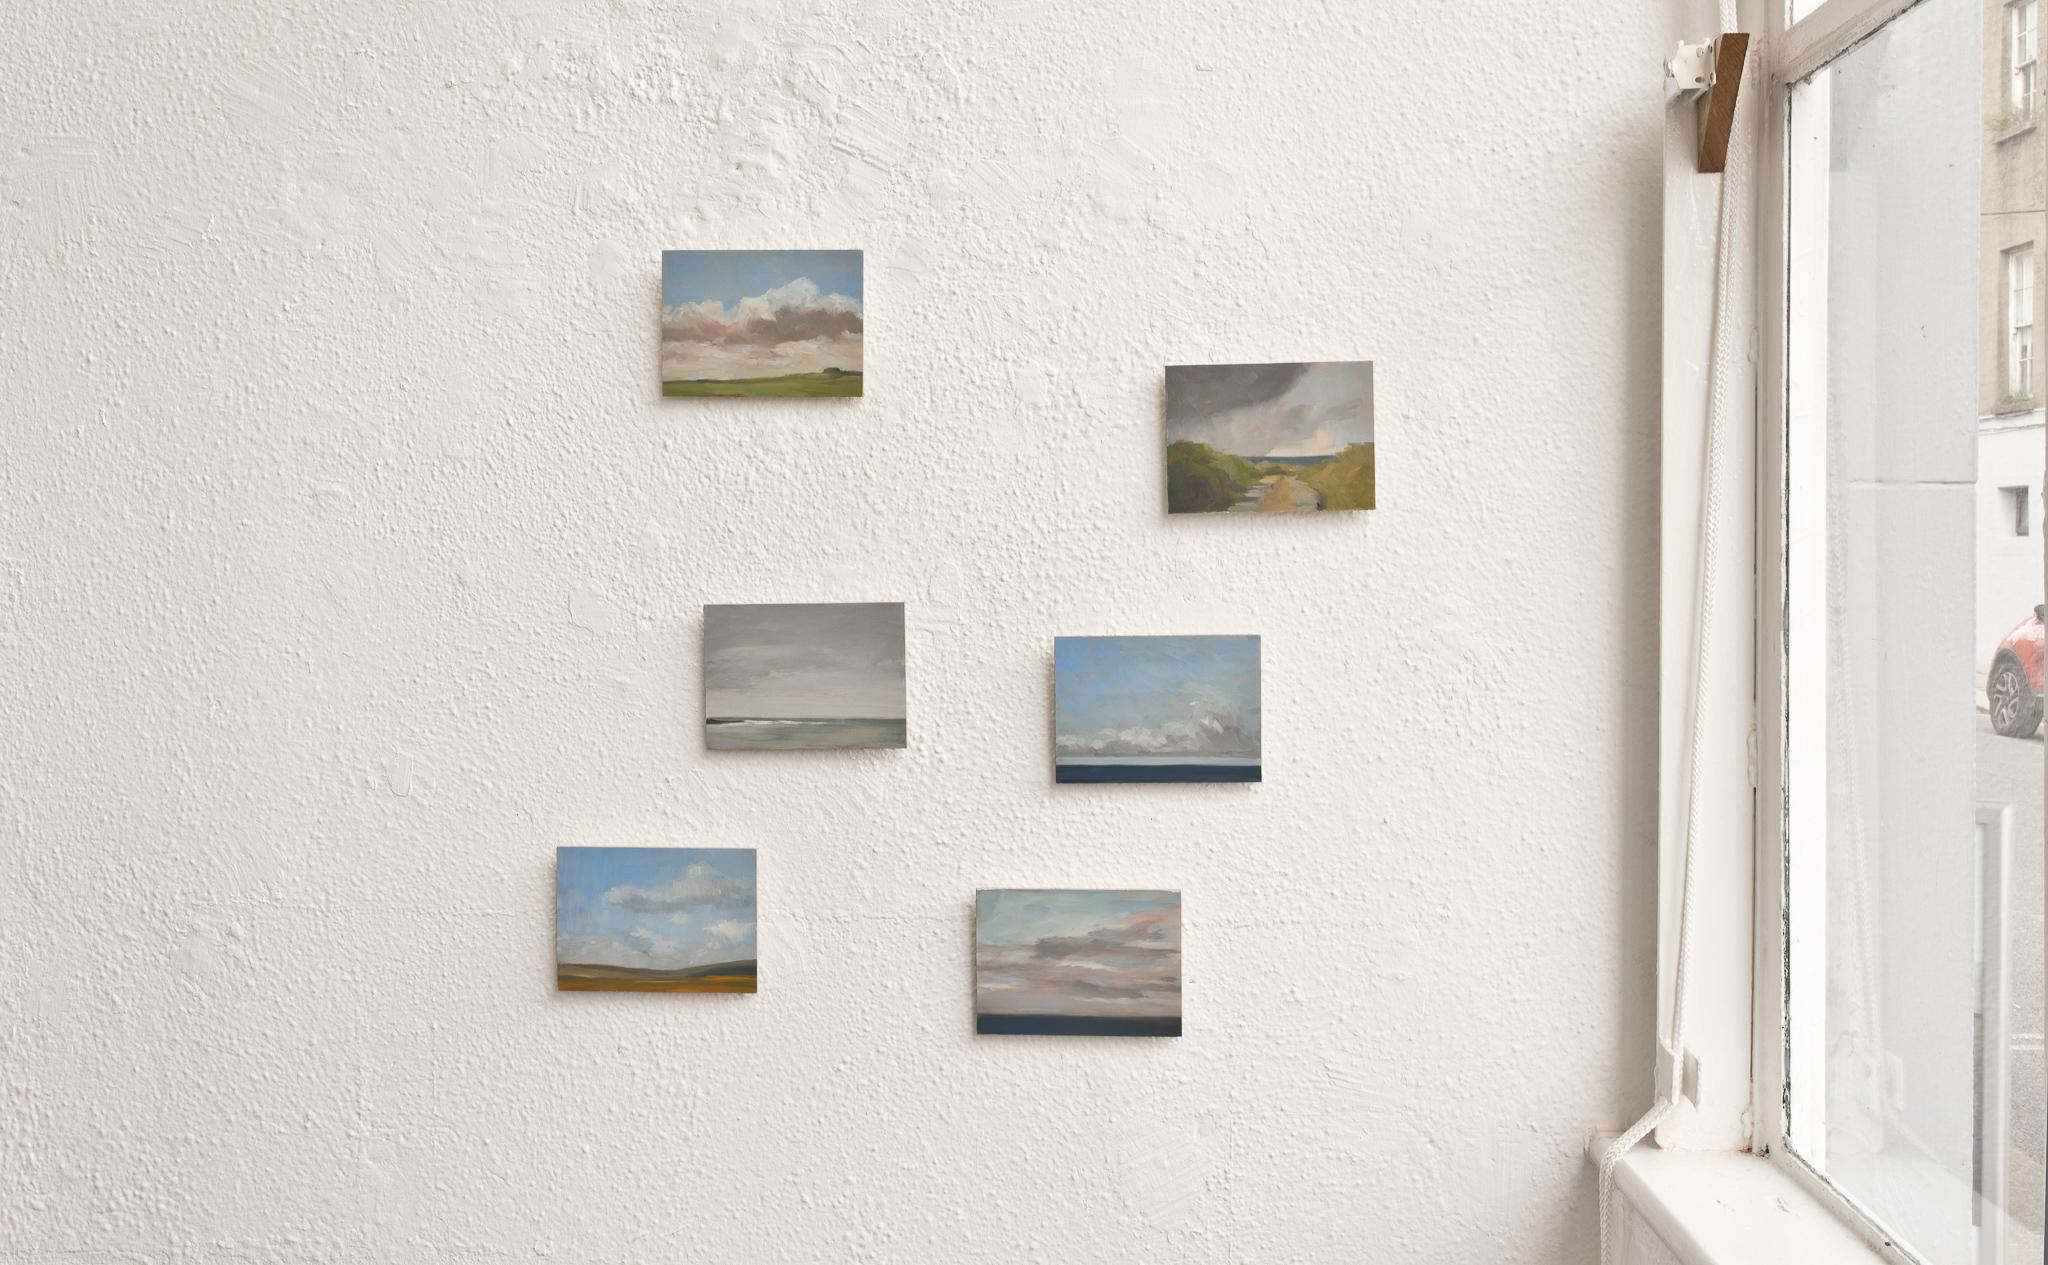 Maria Levinge, Postcards from Ballinglen, 2020, oil on board, 13x18cm - €300